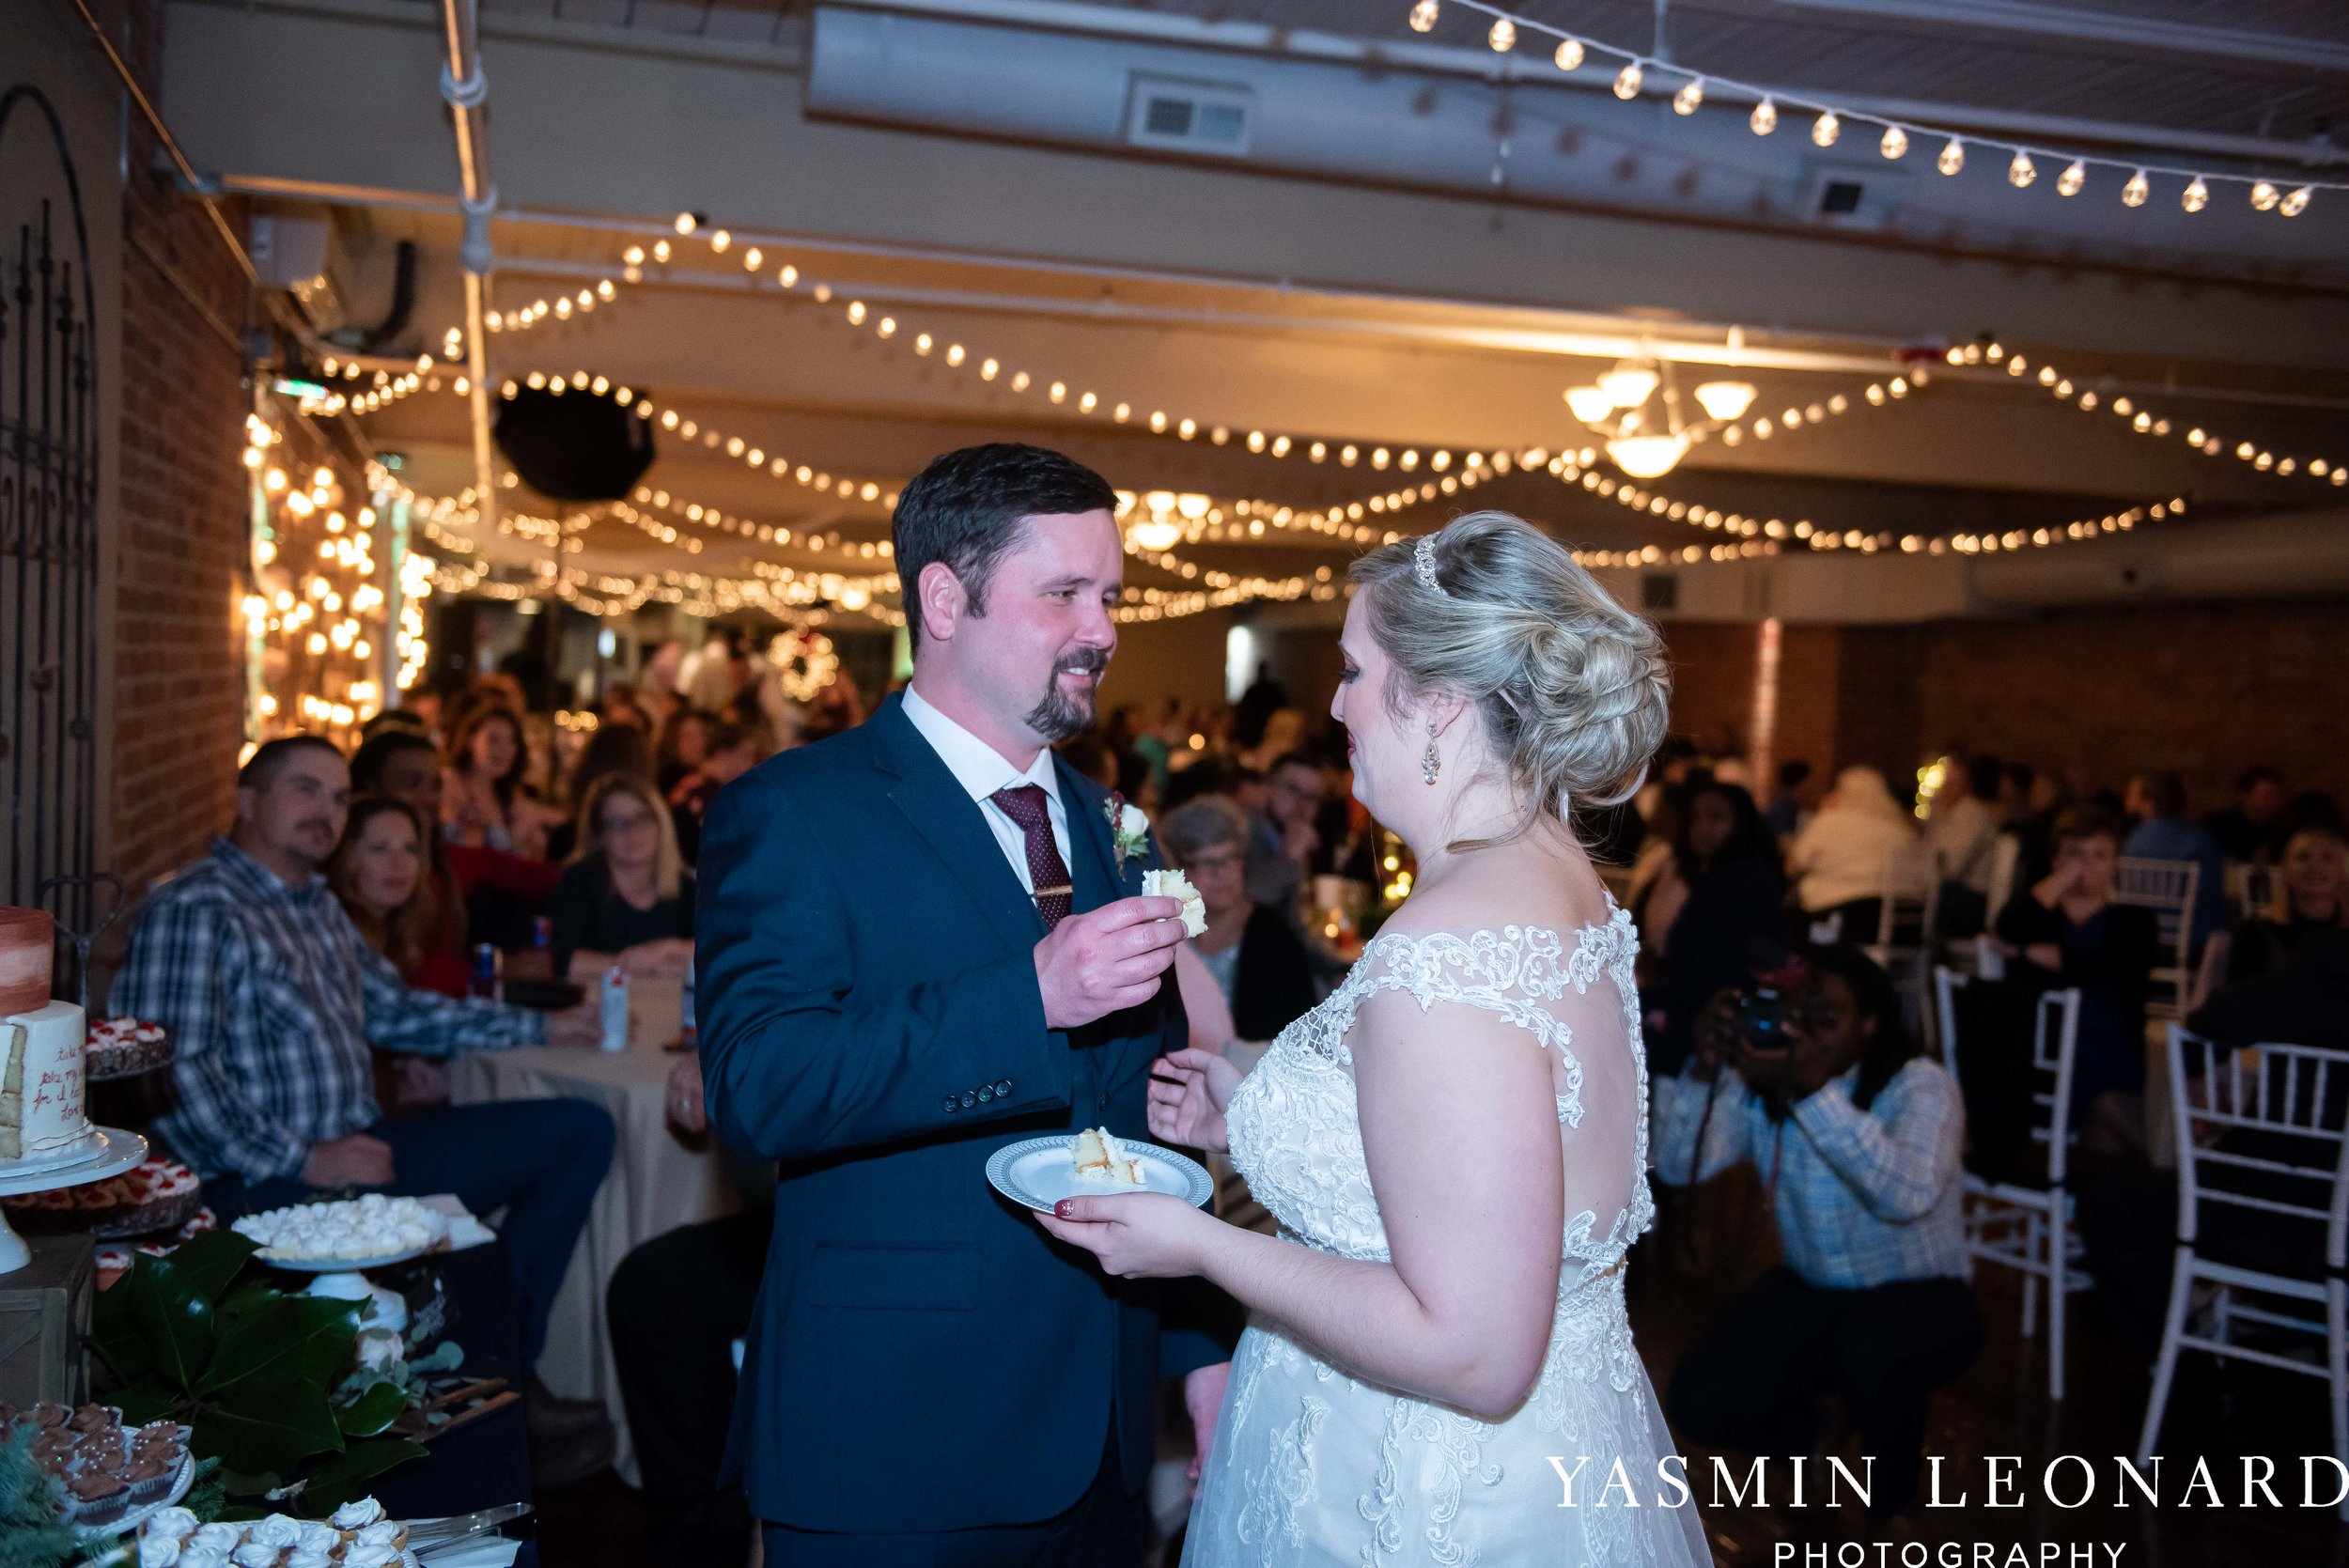 Rebekah and Matt - 105 Worth Event Centre - Yasmin Leonard Photography - Asheboro Wedding - NC Wedding - High Point Weddings - Triad Weddings - Winter Wedding-56.jpg